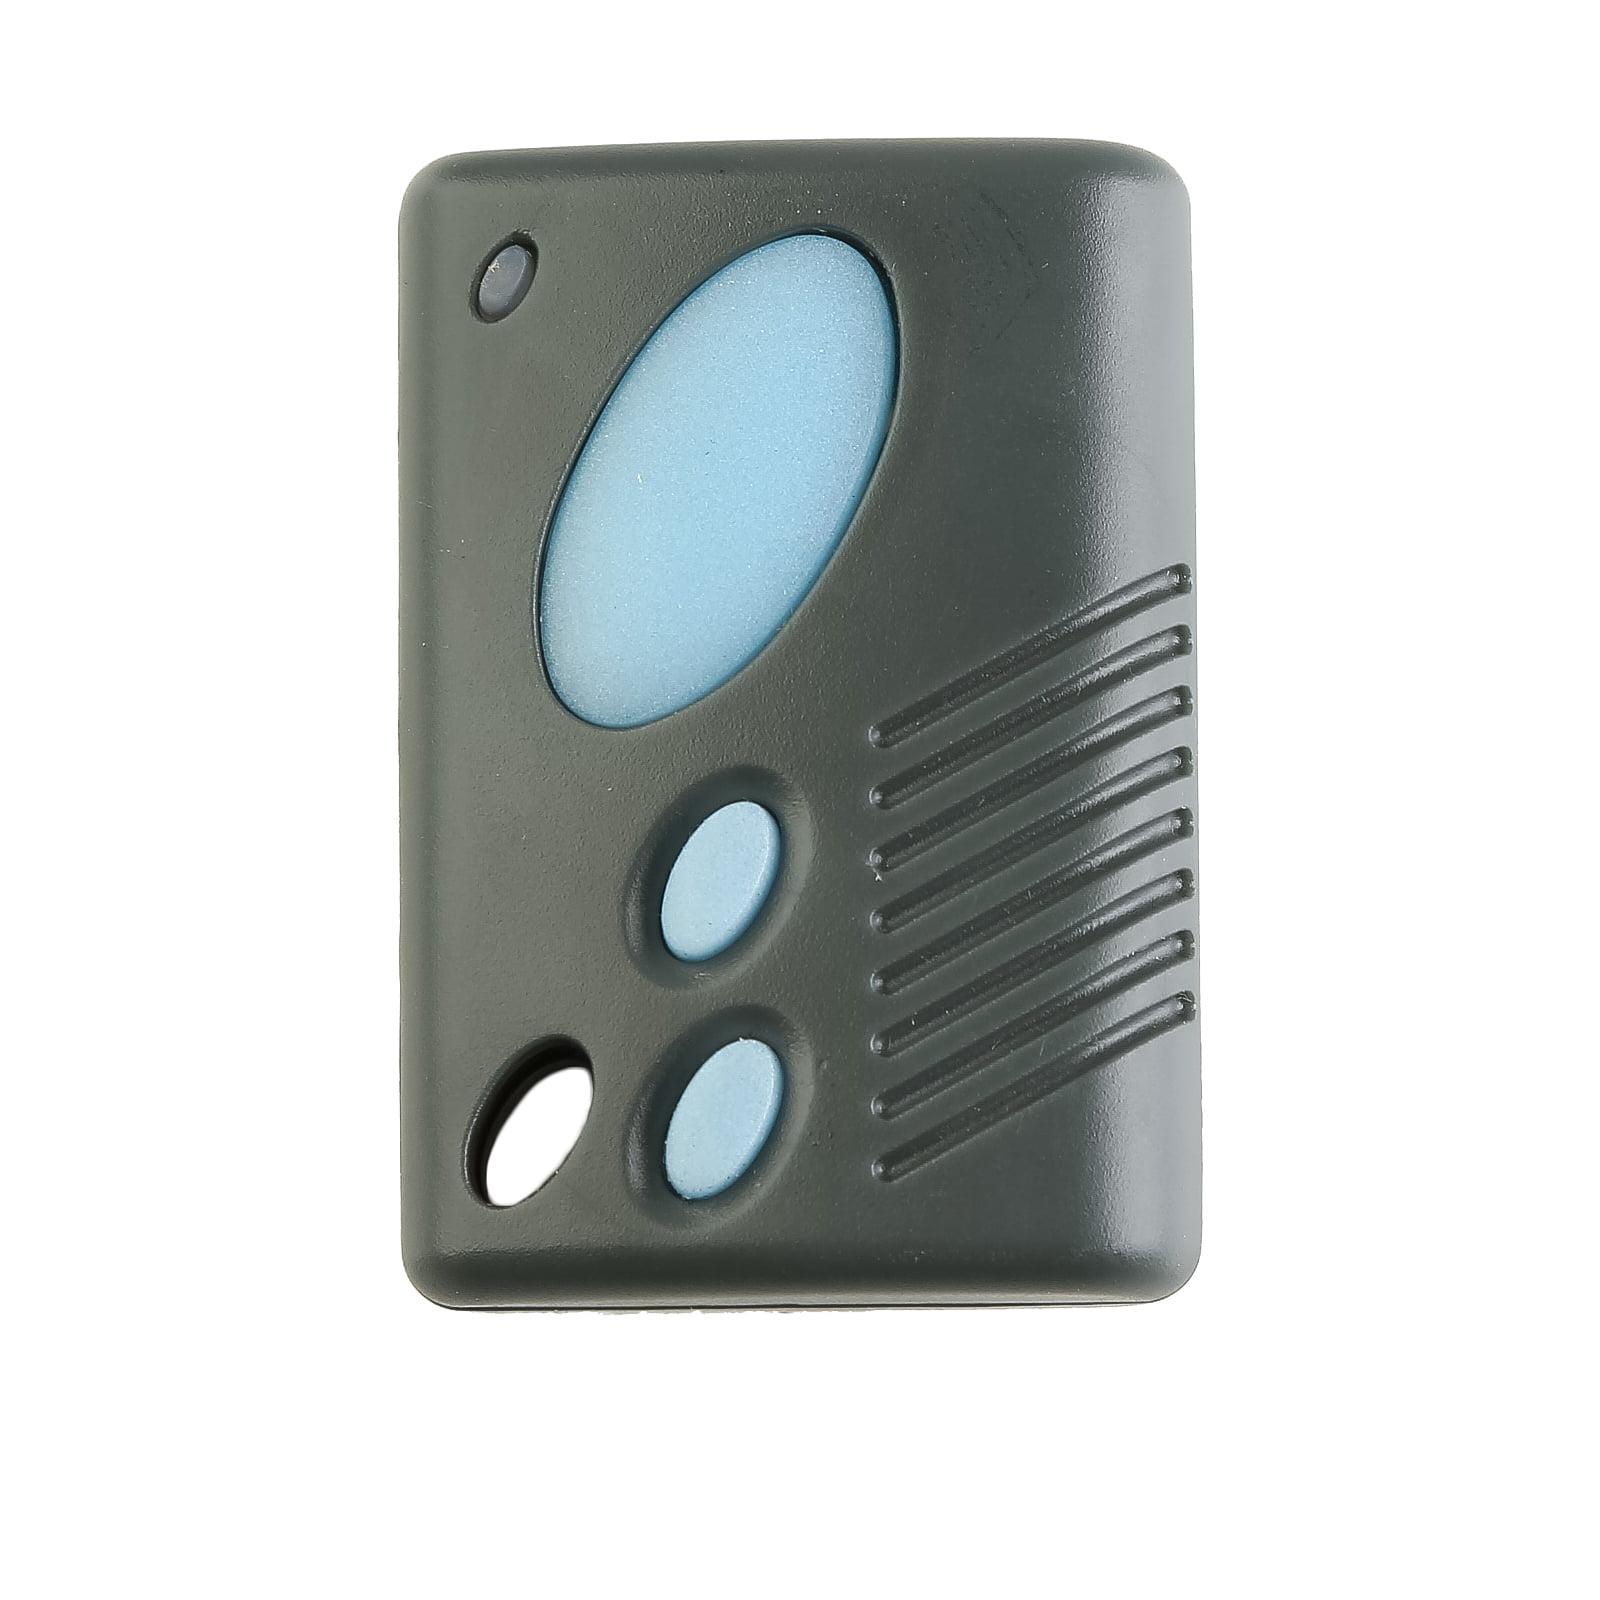 Gliderol Tm305c Garage Door Remote Control National